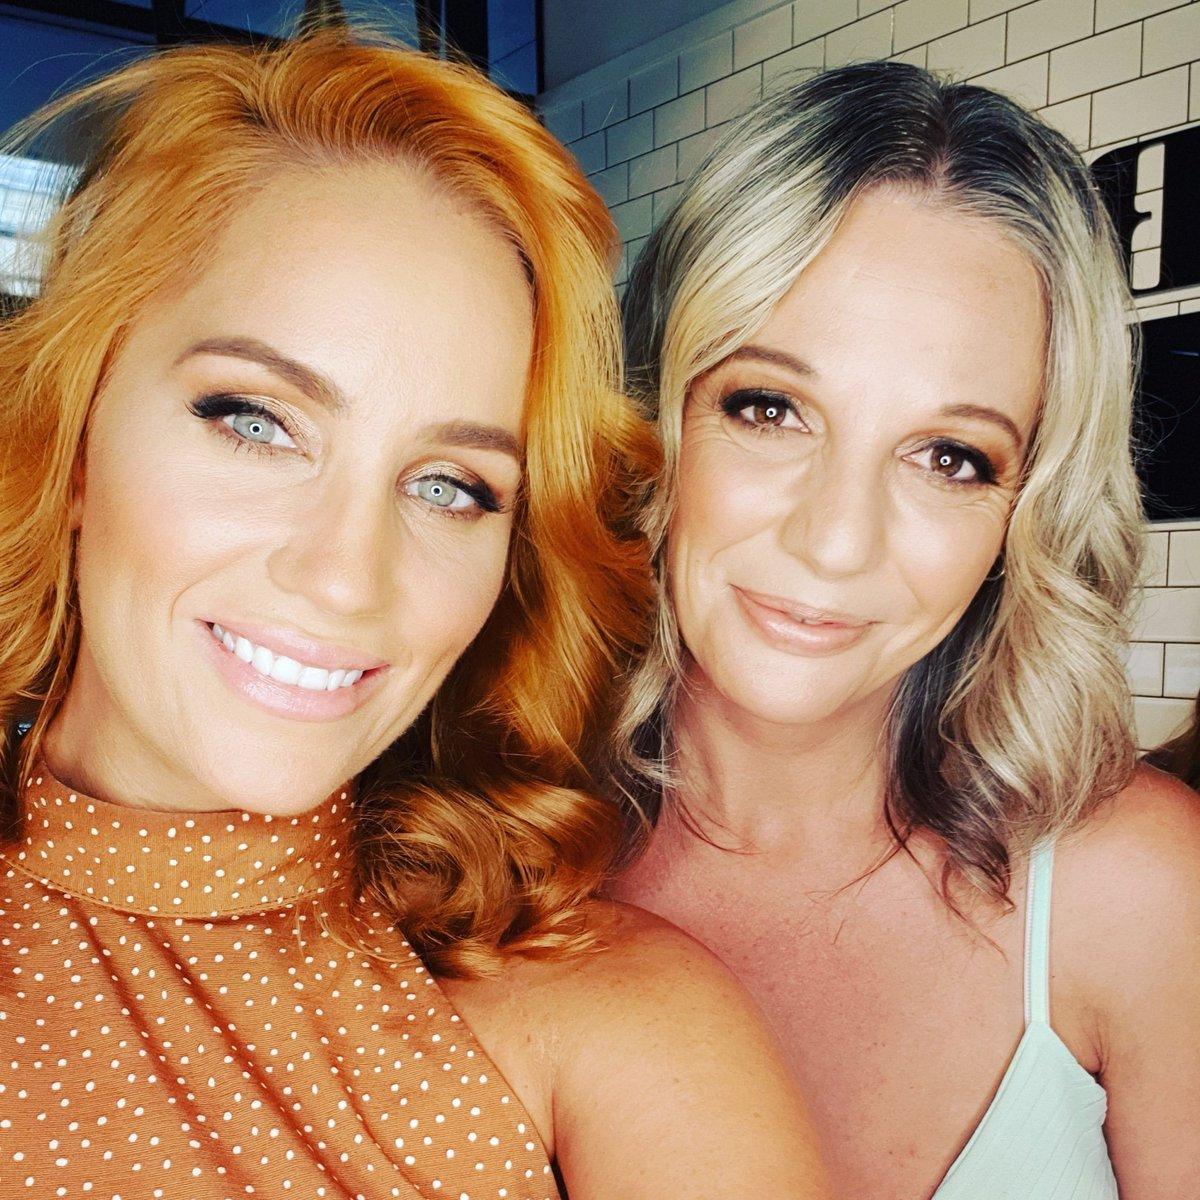 Had the most amazing weekend in Sydney with WW ambassador Jules  . . #sydney #ProudEmployee  #WWAmbassadorAUNZ  #womanempoweringwoman #shapewearpic.twitter.com/QSU4rrGOx1